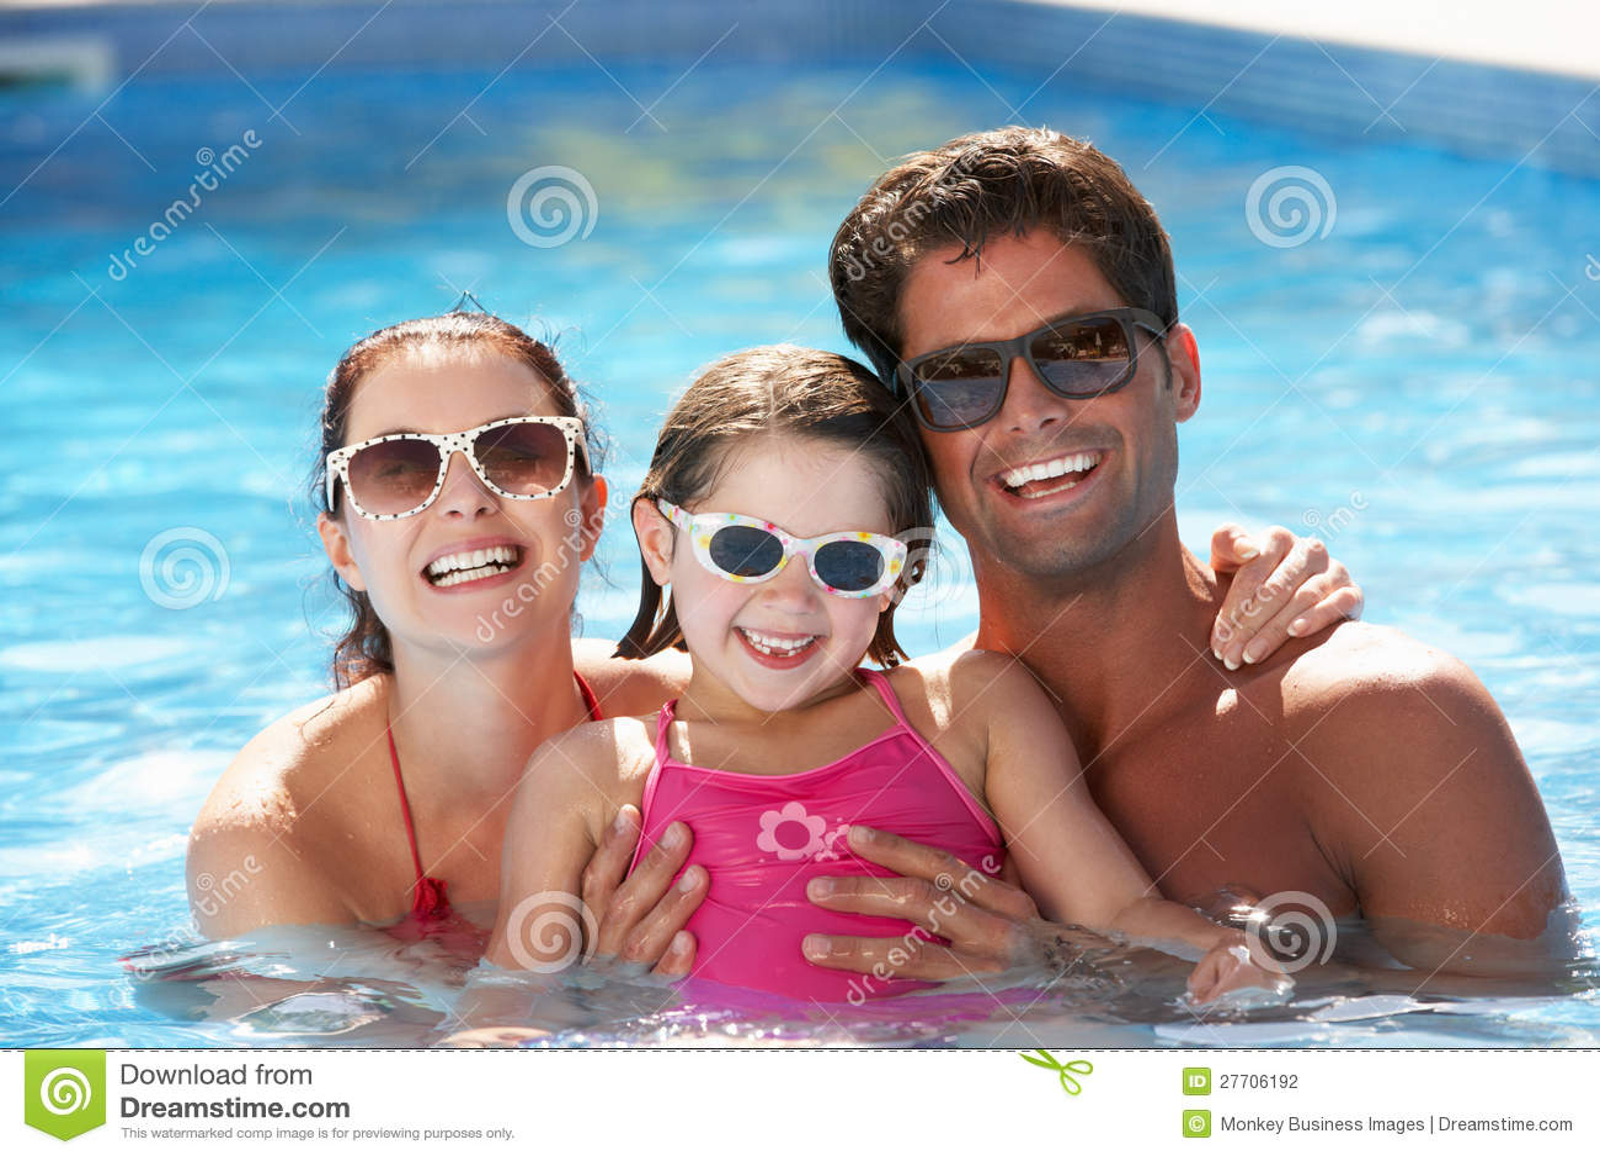 Stock Photography: Family Having Fun In Swimming Pool